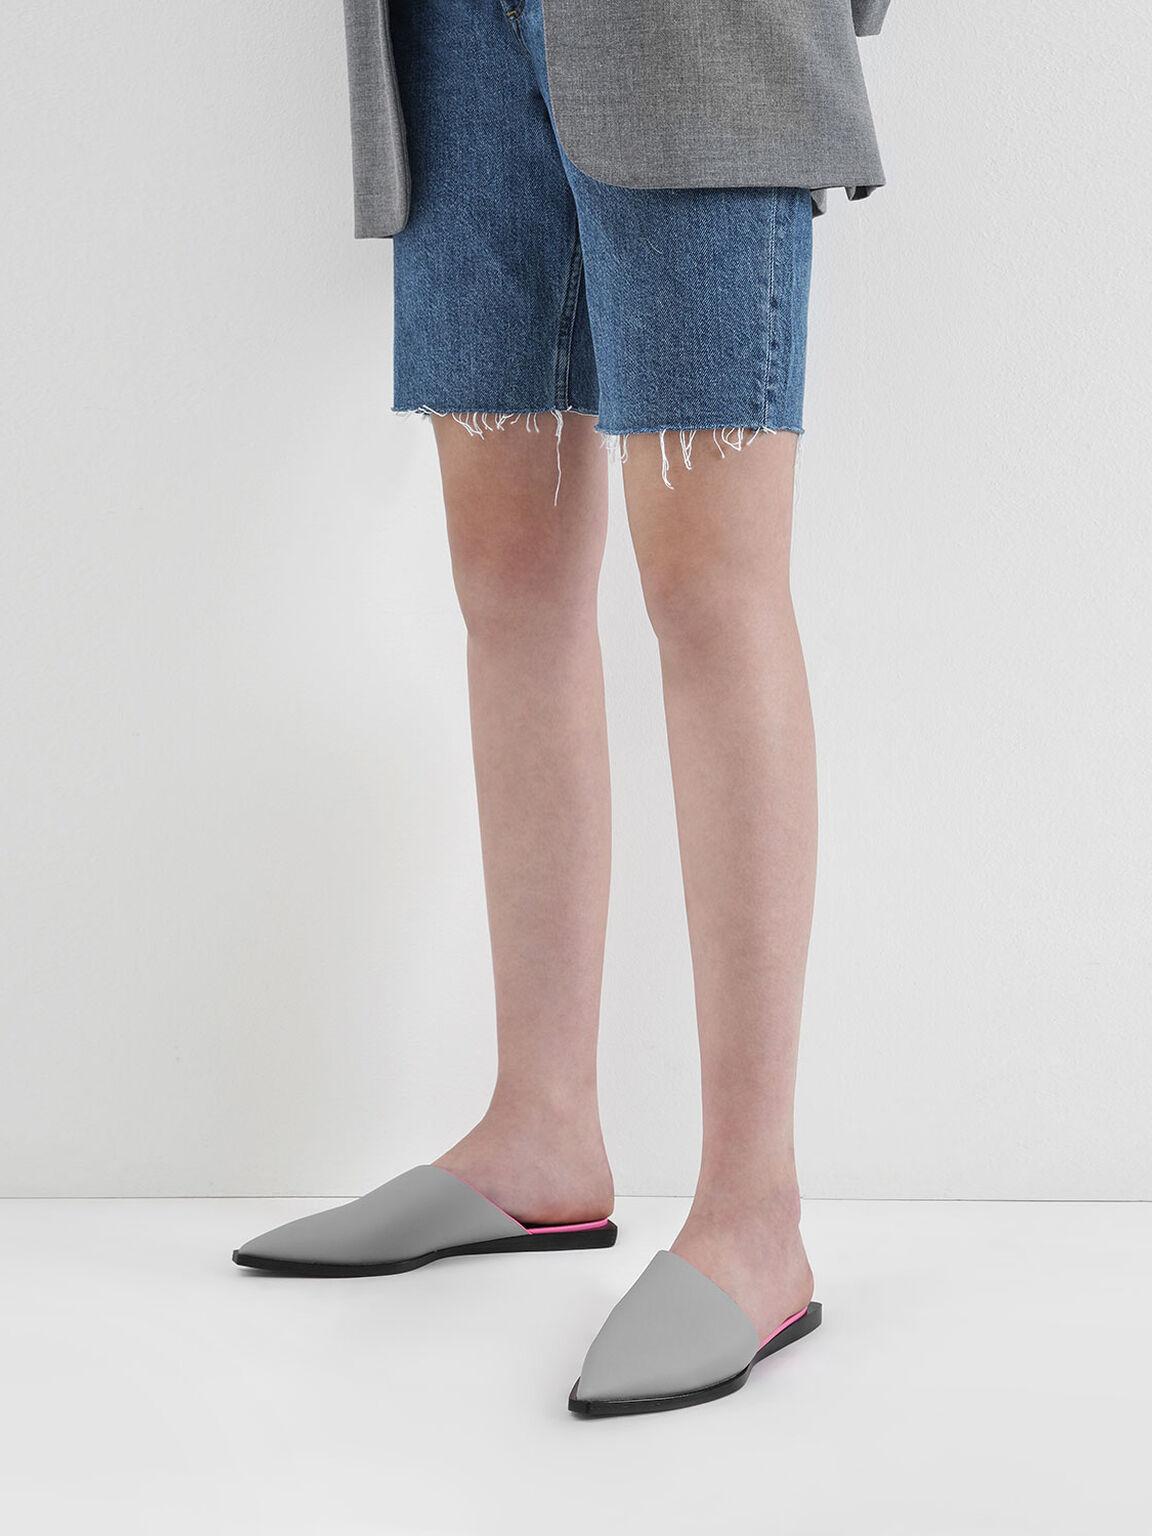 Asymmetric Mules, Grey, hi-res